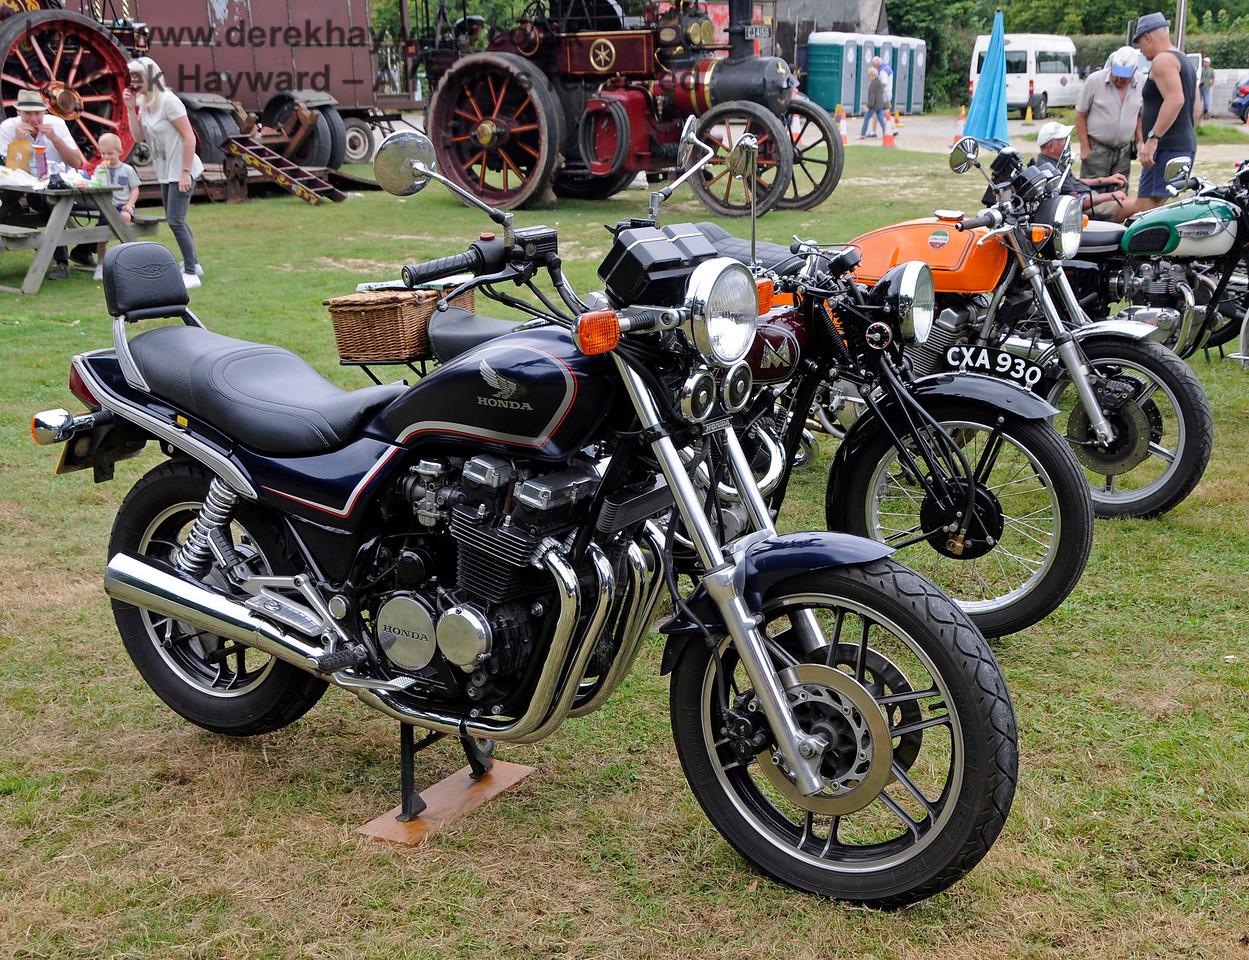 Vintage Transport Weekend, Horsted Keynes, 13.08.2016  15997